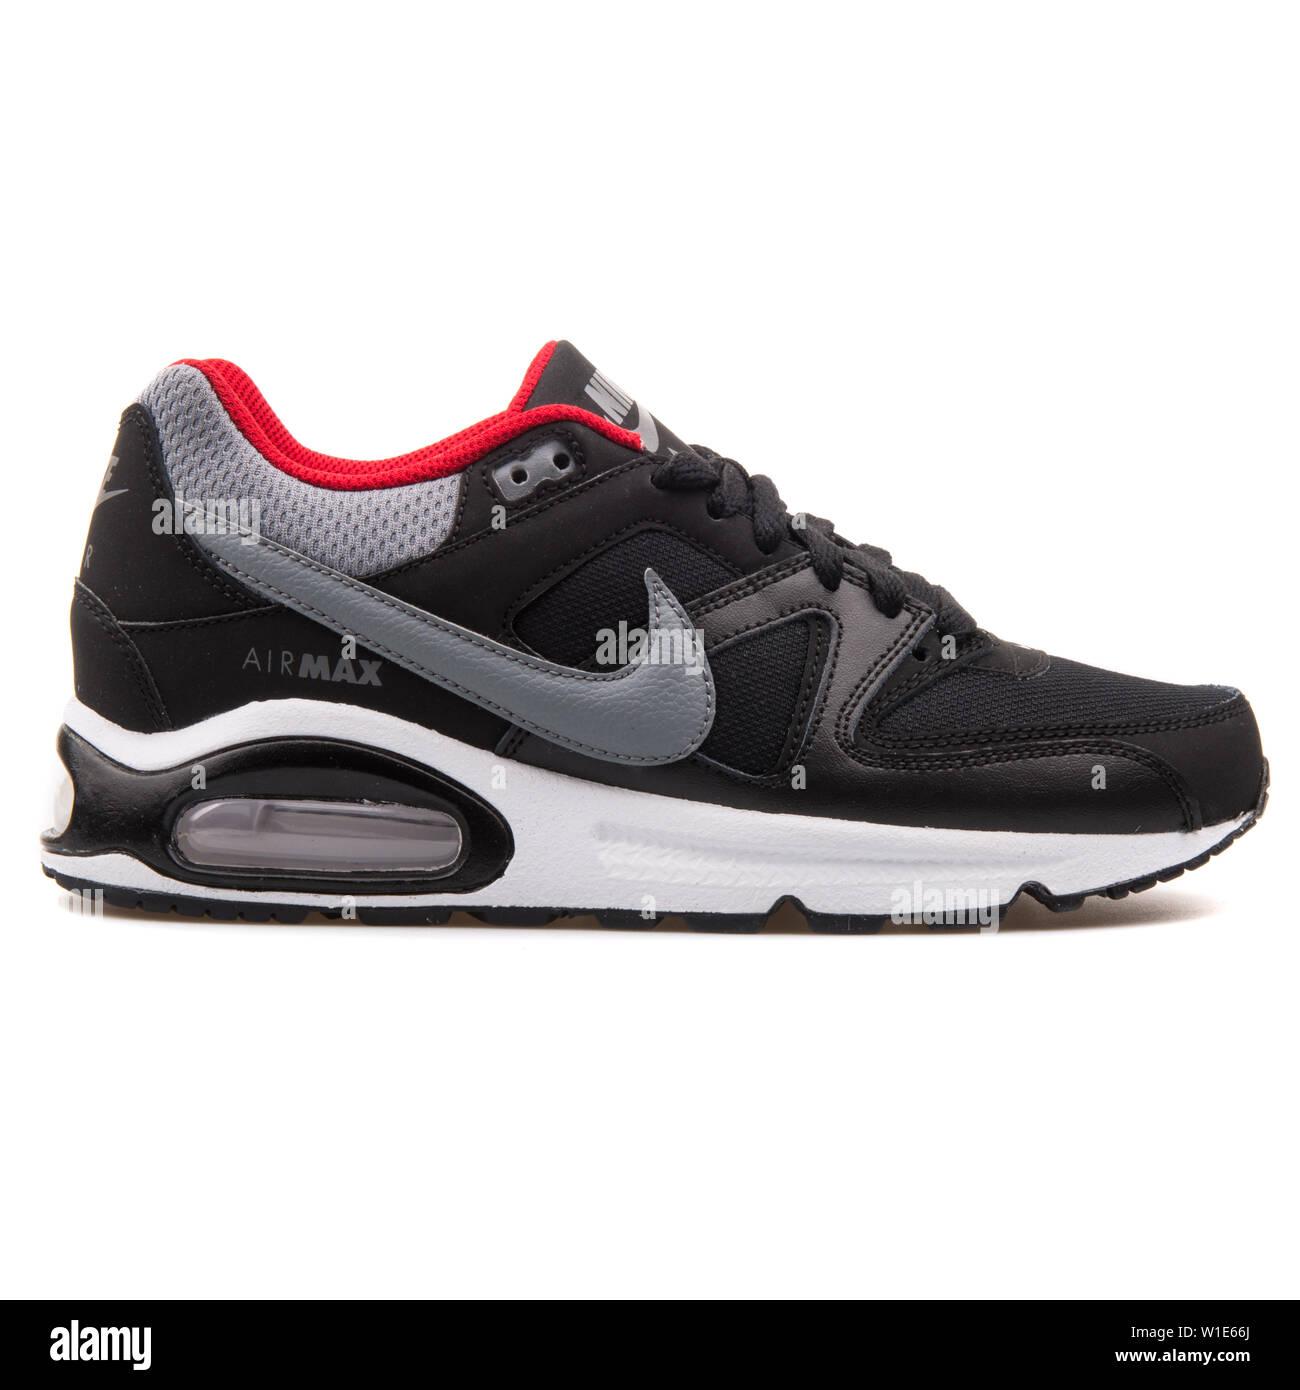 2017: Nike Air Max Command black, grey